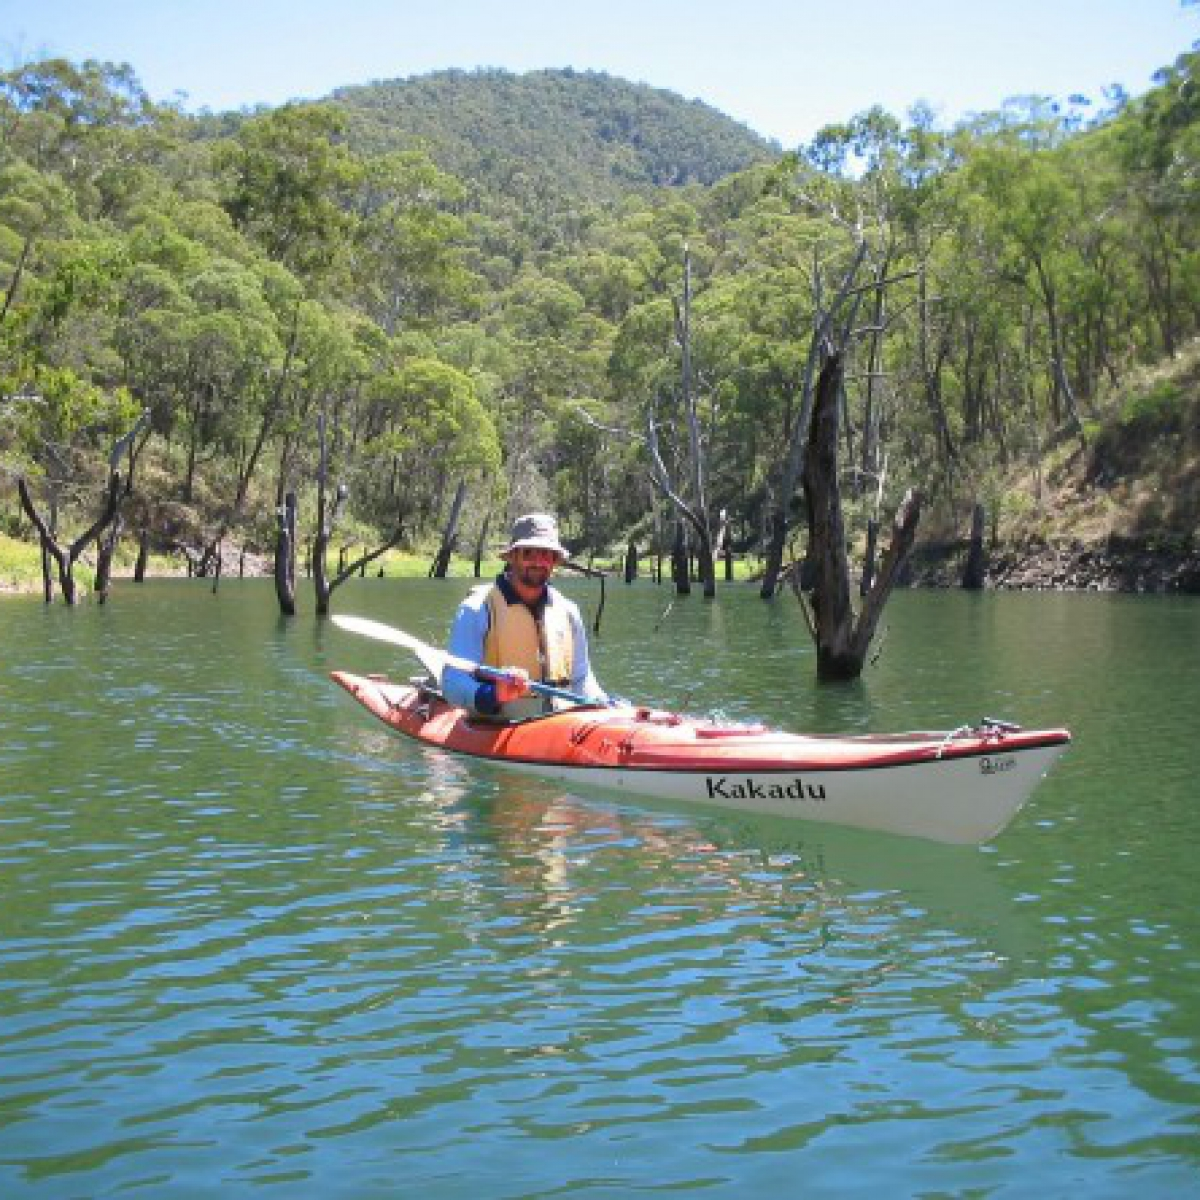 On Talbingo Reservoir